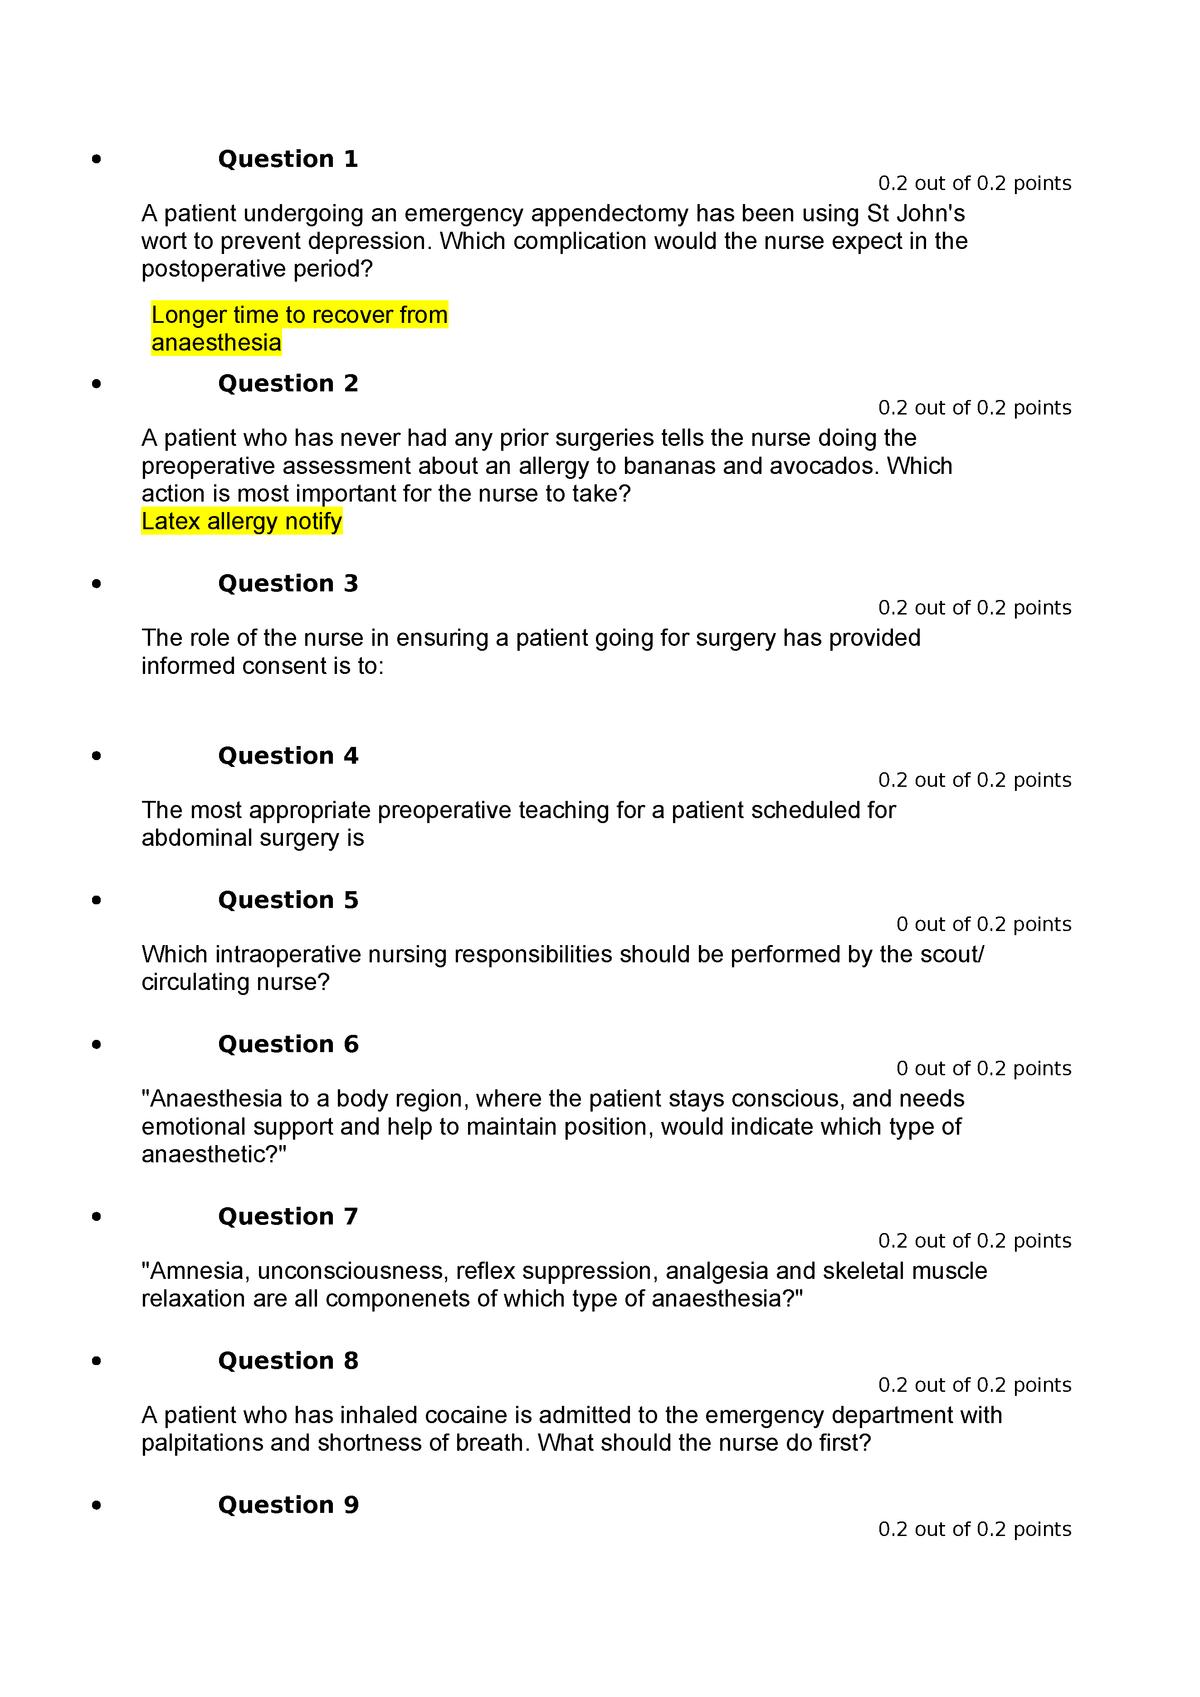 Exam 2019 - NCS2101: Adult Health - StuDocu